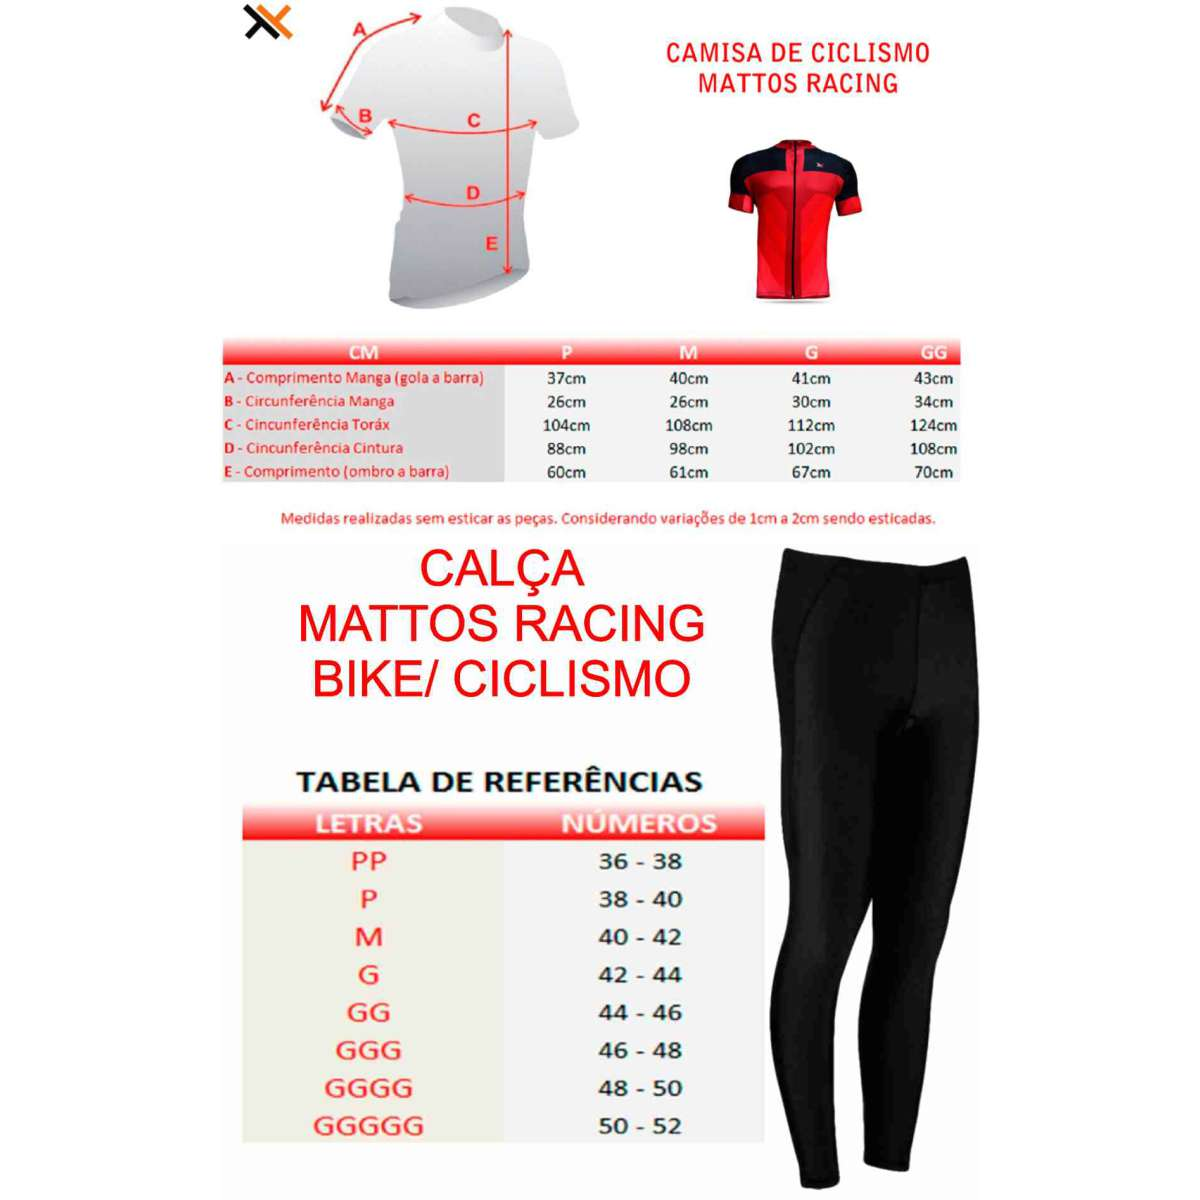 CONJUNTO CICLISMO CAMISA MATTOS RACING BIKE LISA MTB AMARELO + CALÇA PRETO FORRO GEL MOUNTAIN BIKE